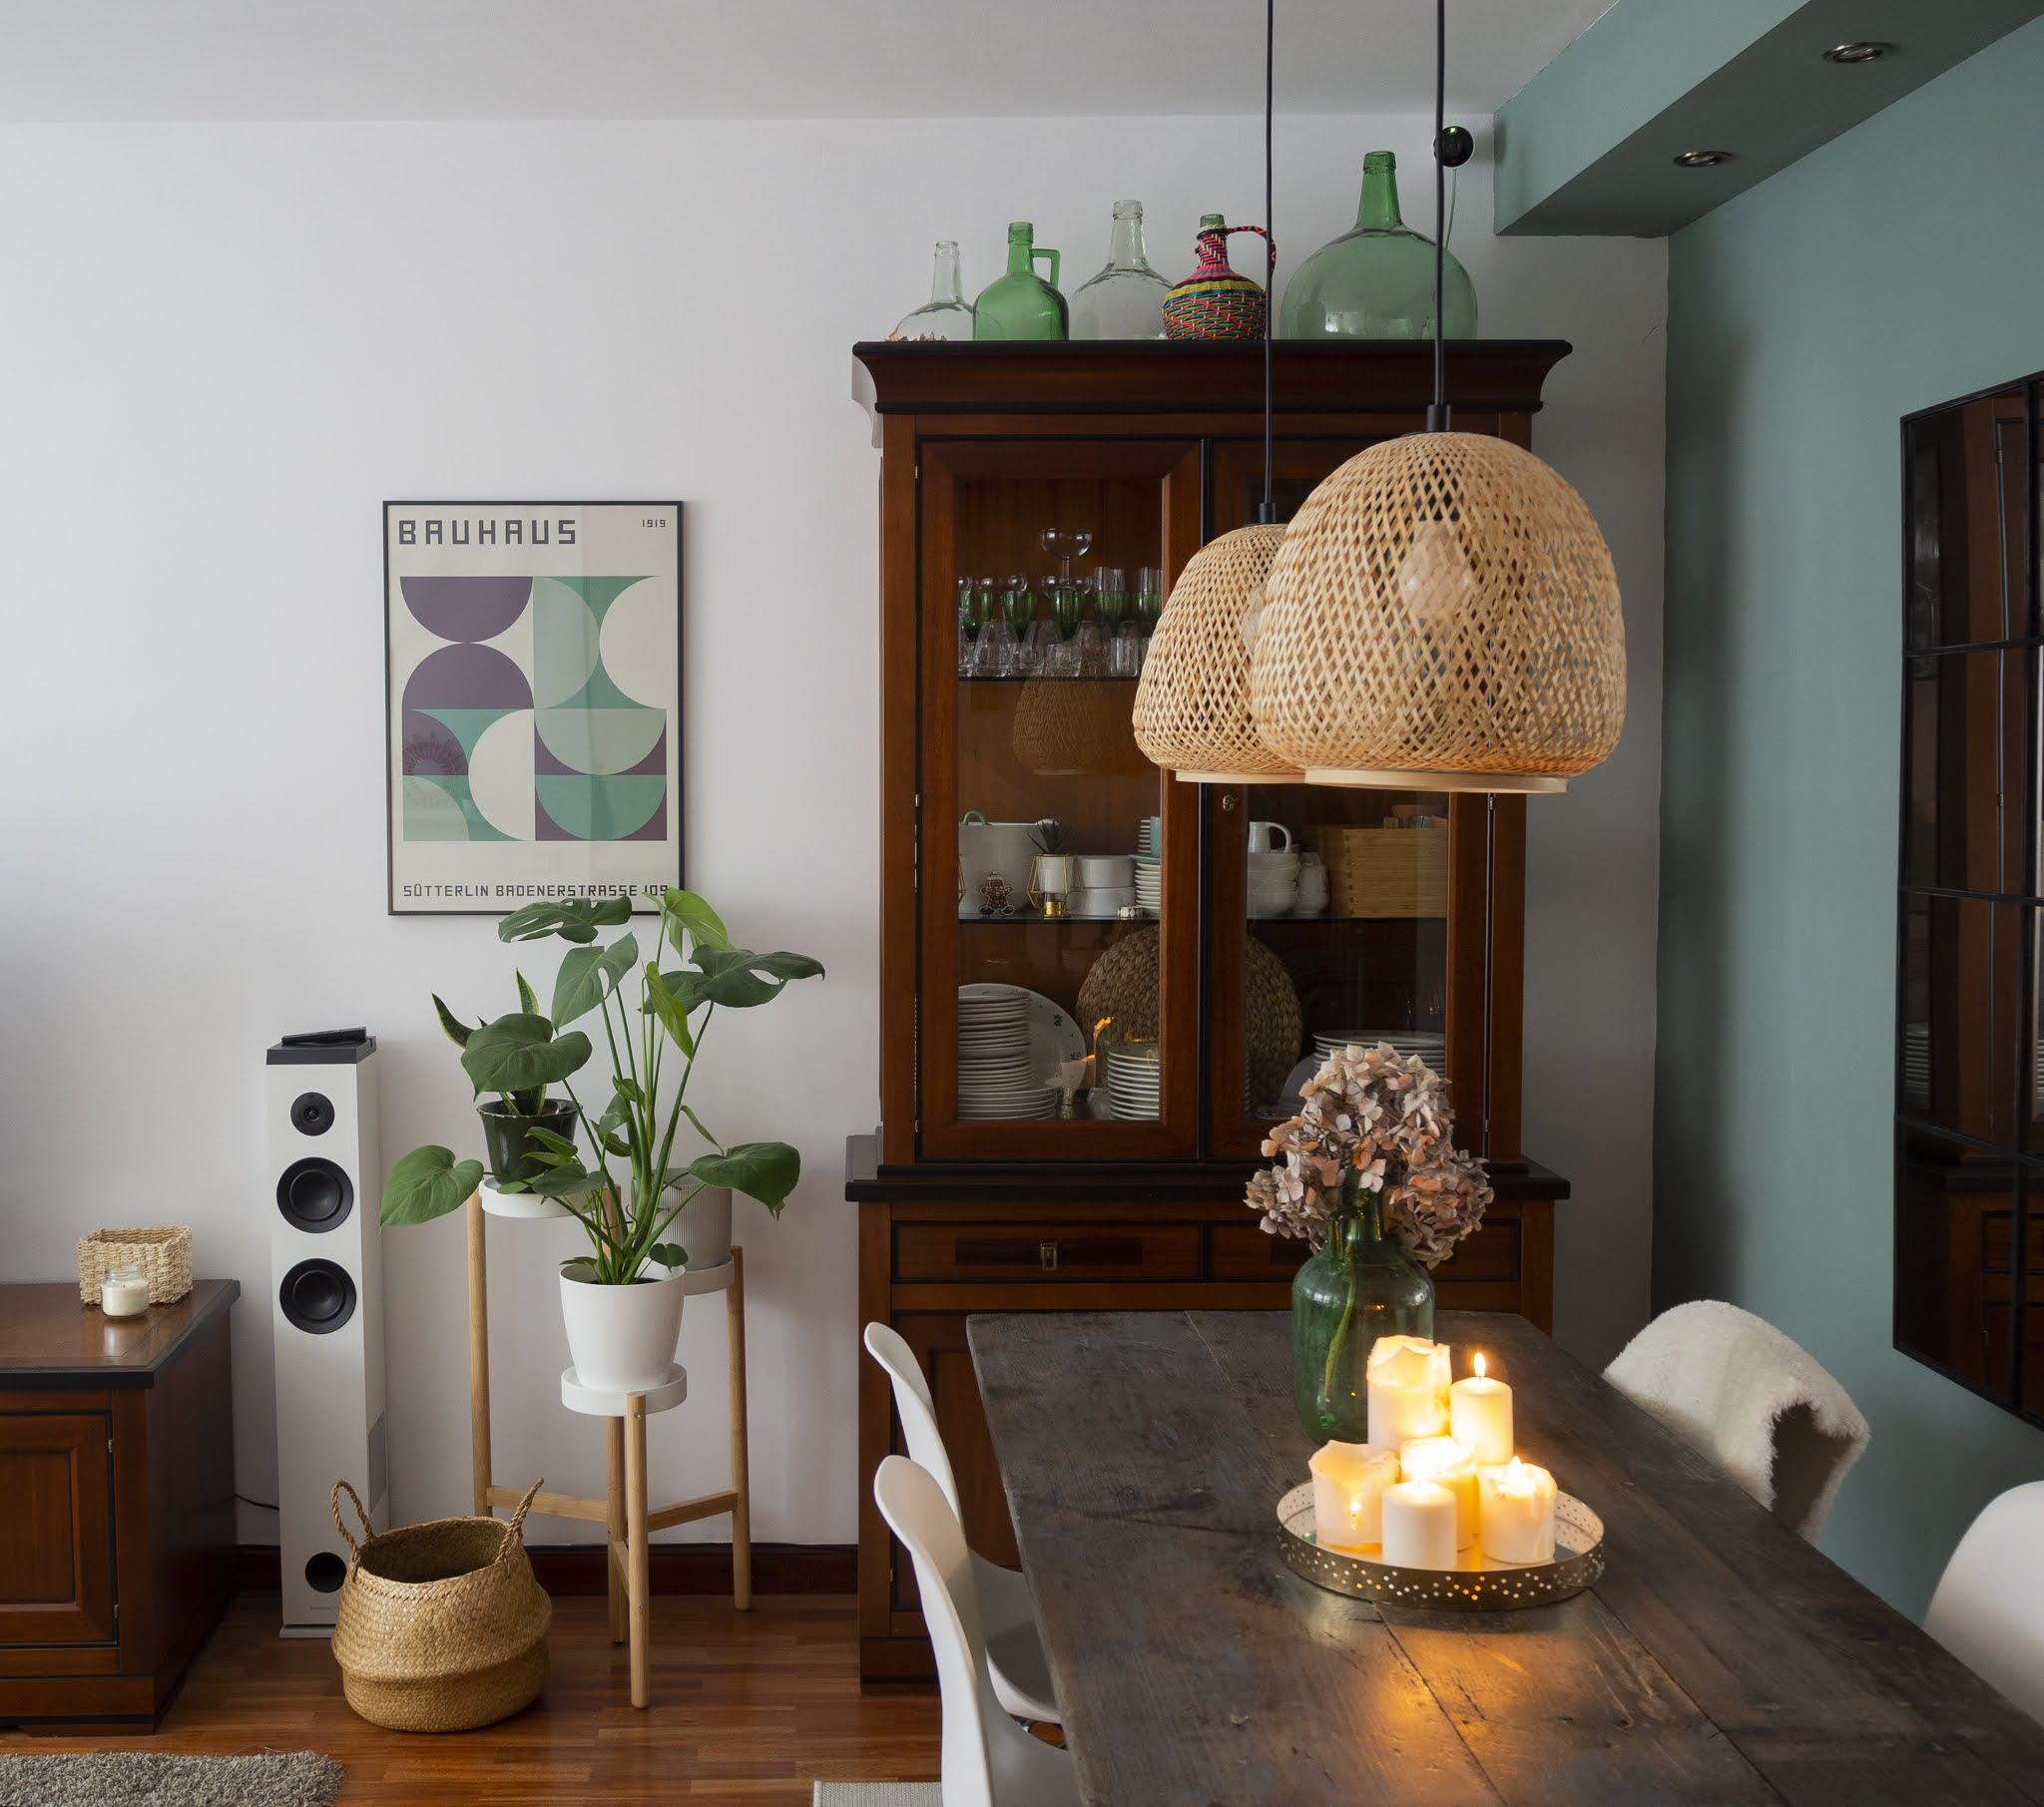 4 trucos para decorar de forma coherente vuestro hogar_6